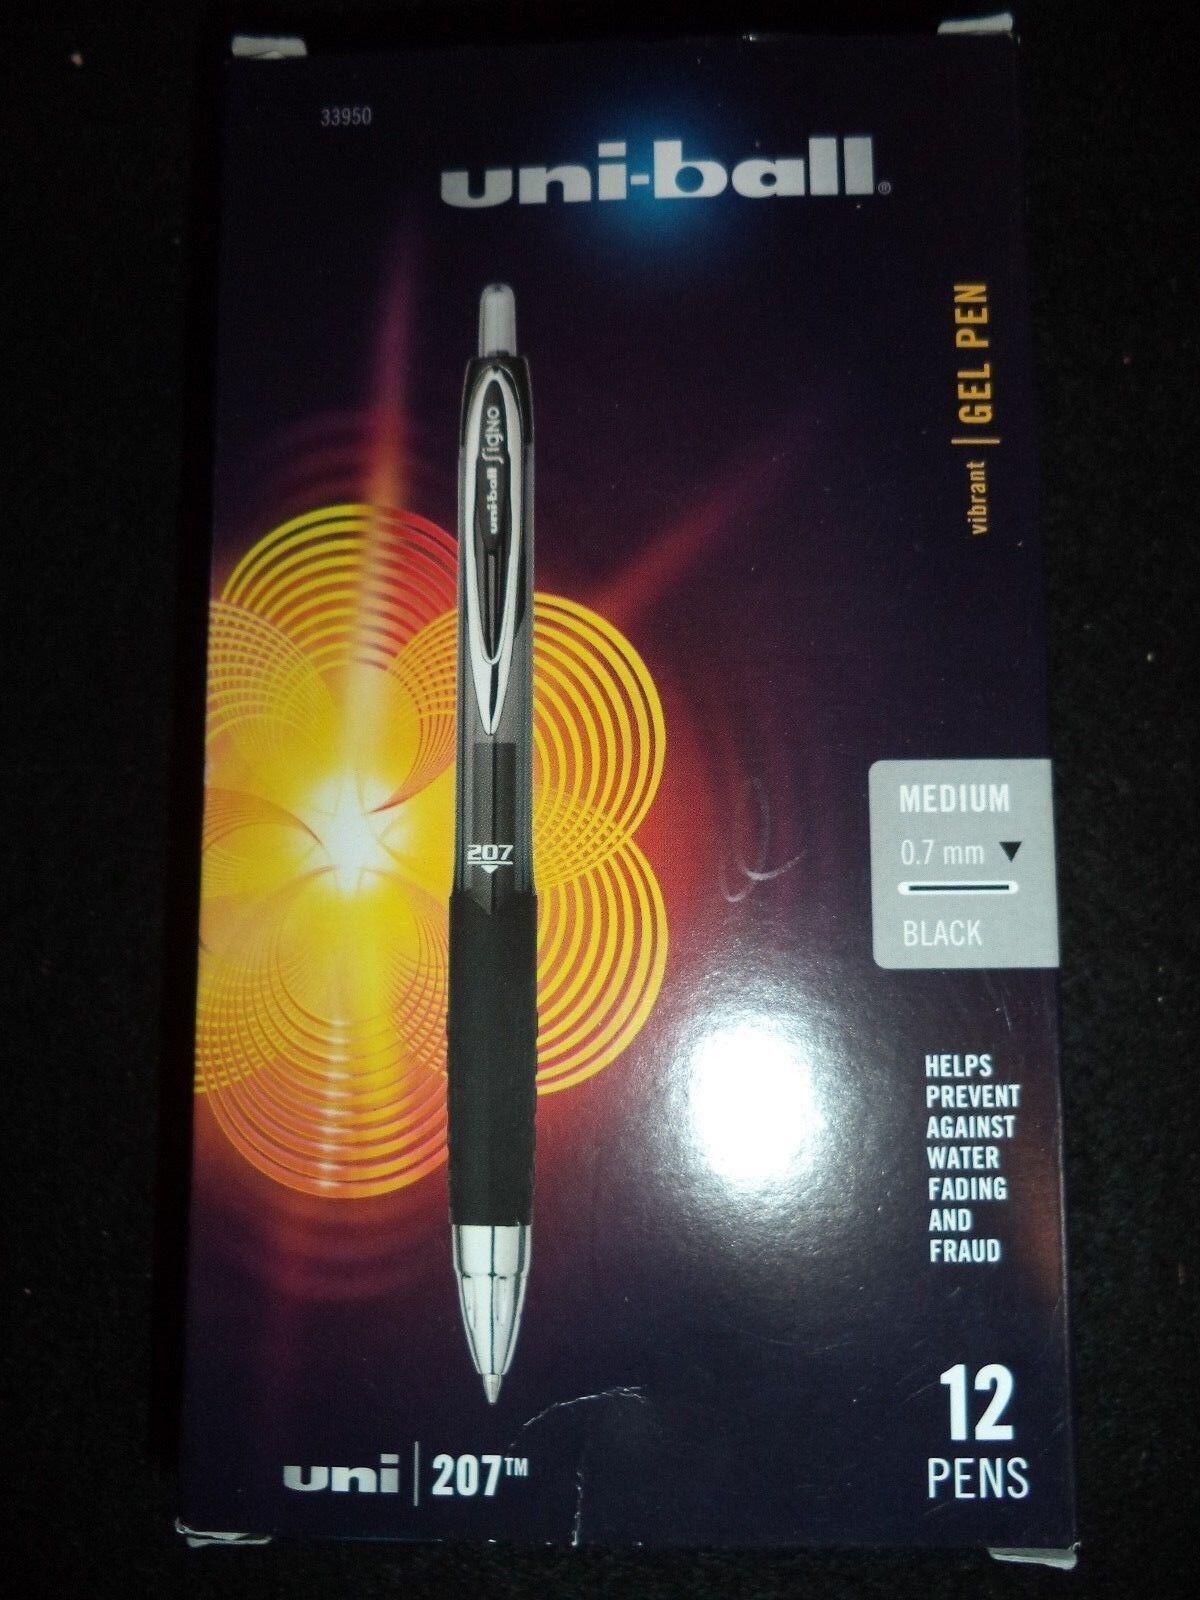 uni-ball 207 Retractable Gel Pens, Medium Point, Black, Box